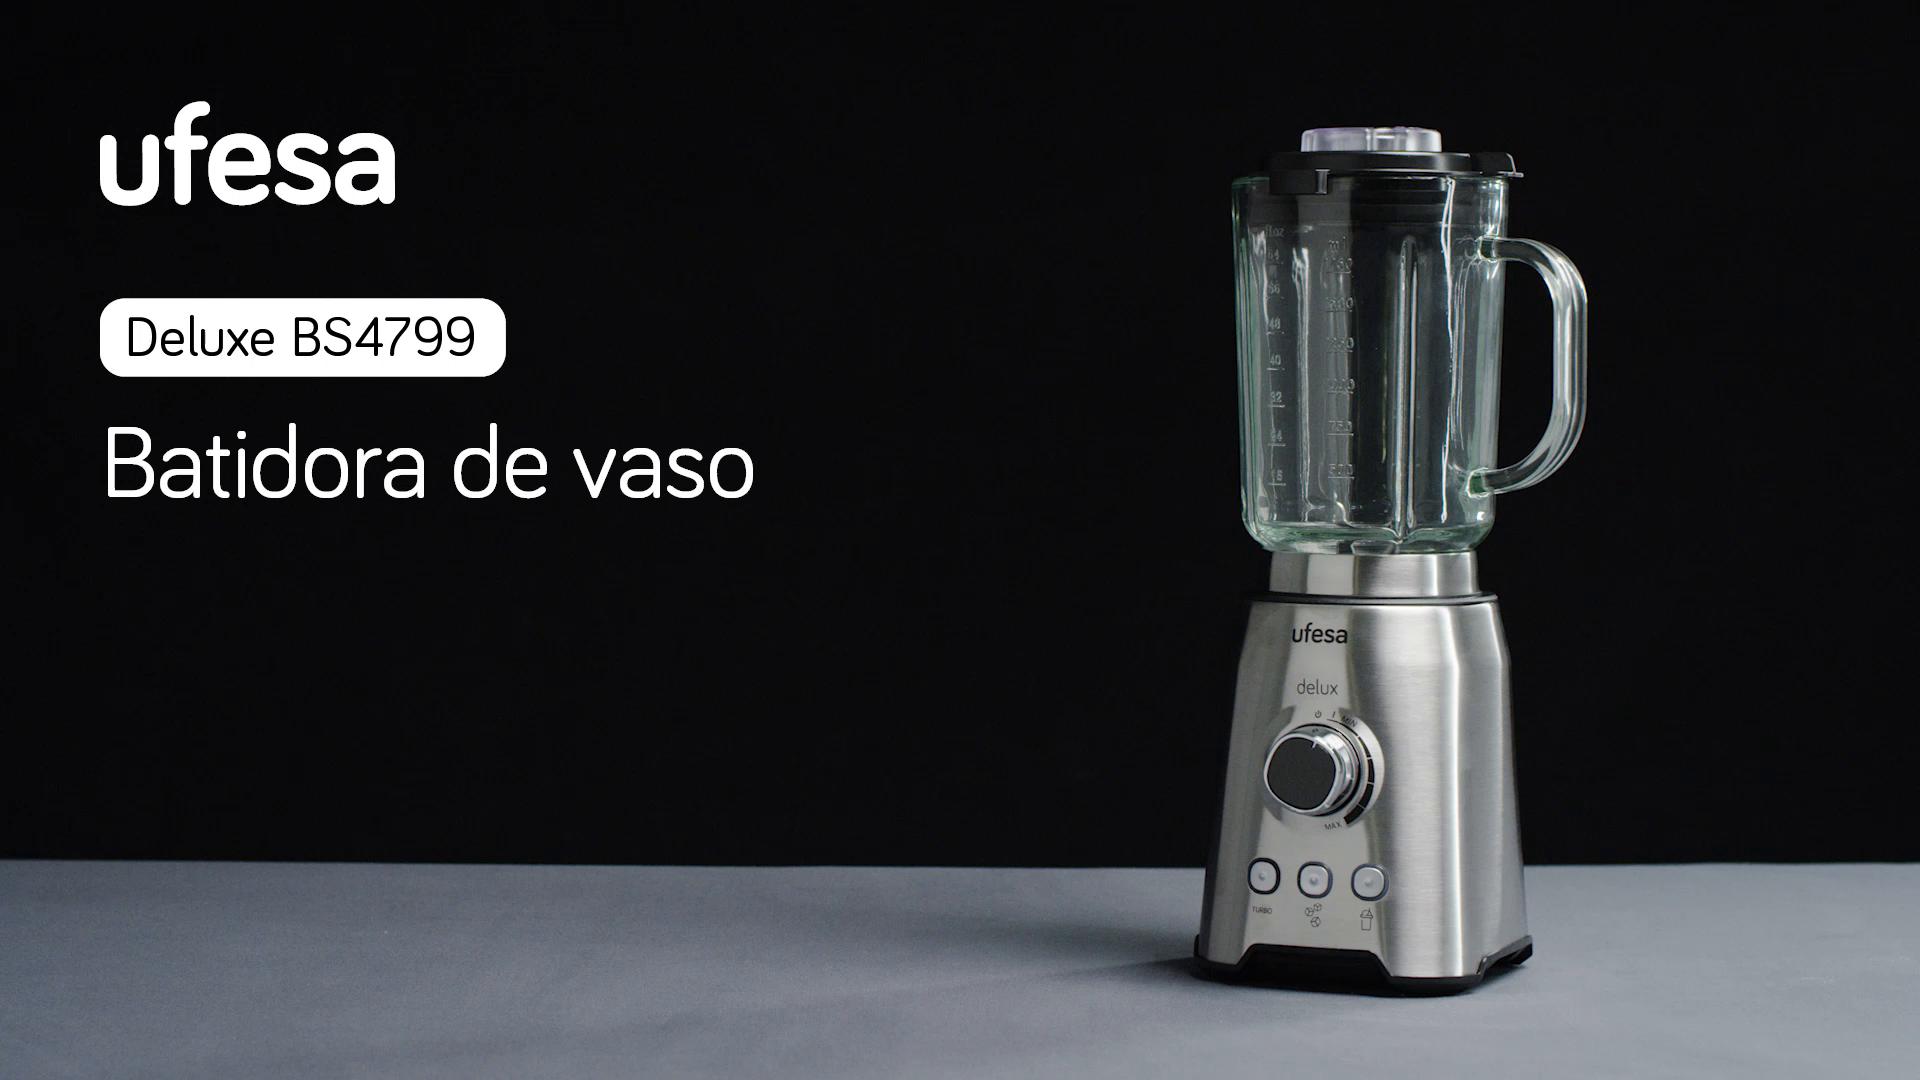 Ufesa BS4799 delux - Batidora de Vaso. 1200 W, Jarra de cristal ...